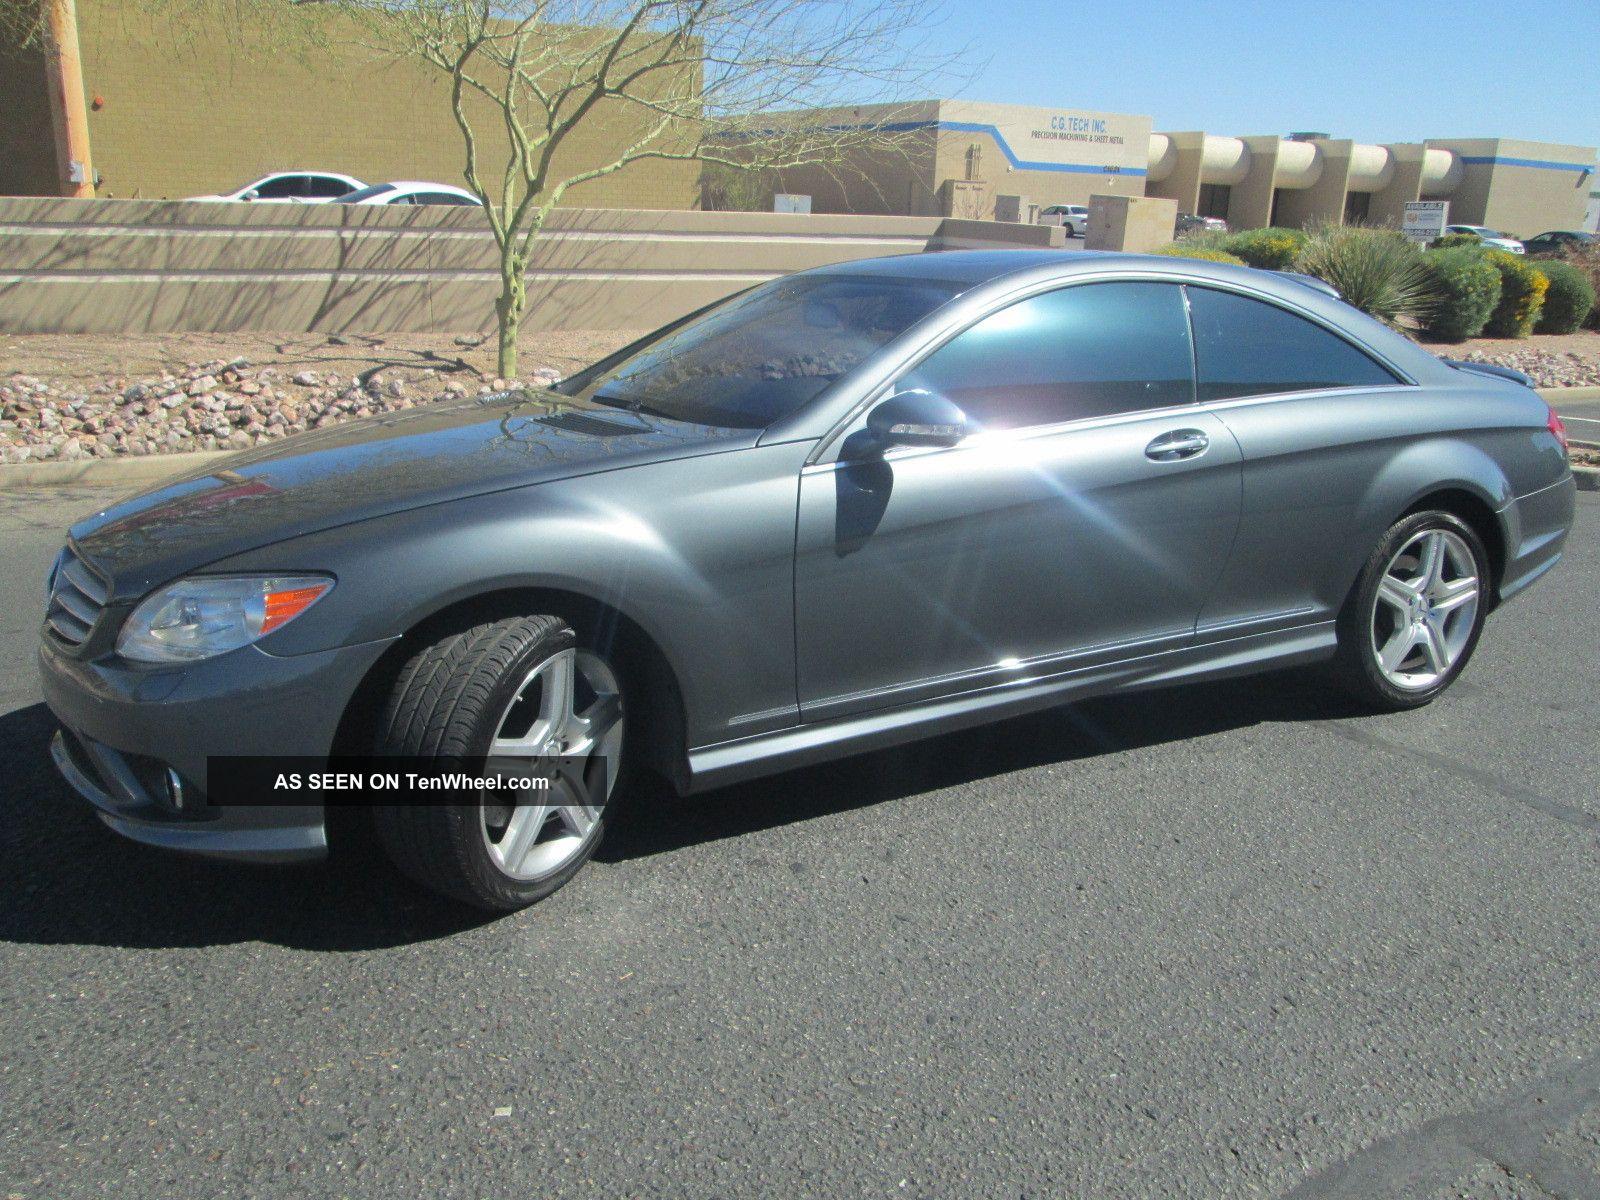 2009 mercedes benz cl550 4matic coupe 2 door 5 5l awd for 2009 mercedes benz cl550